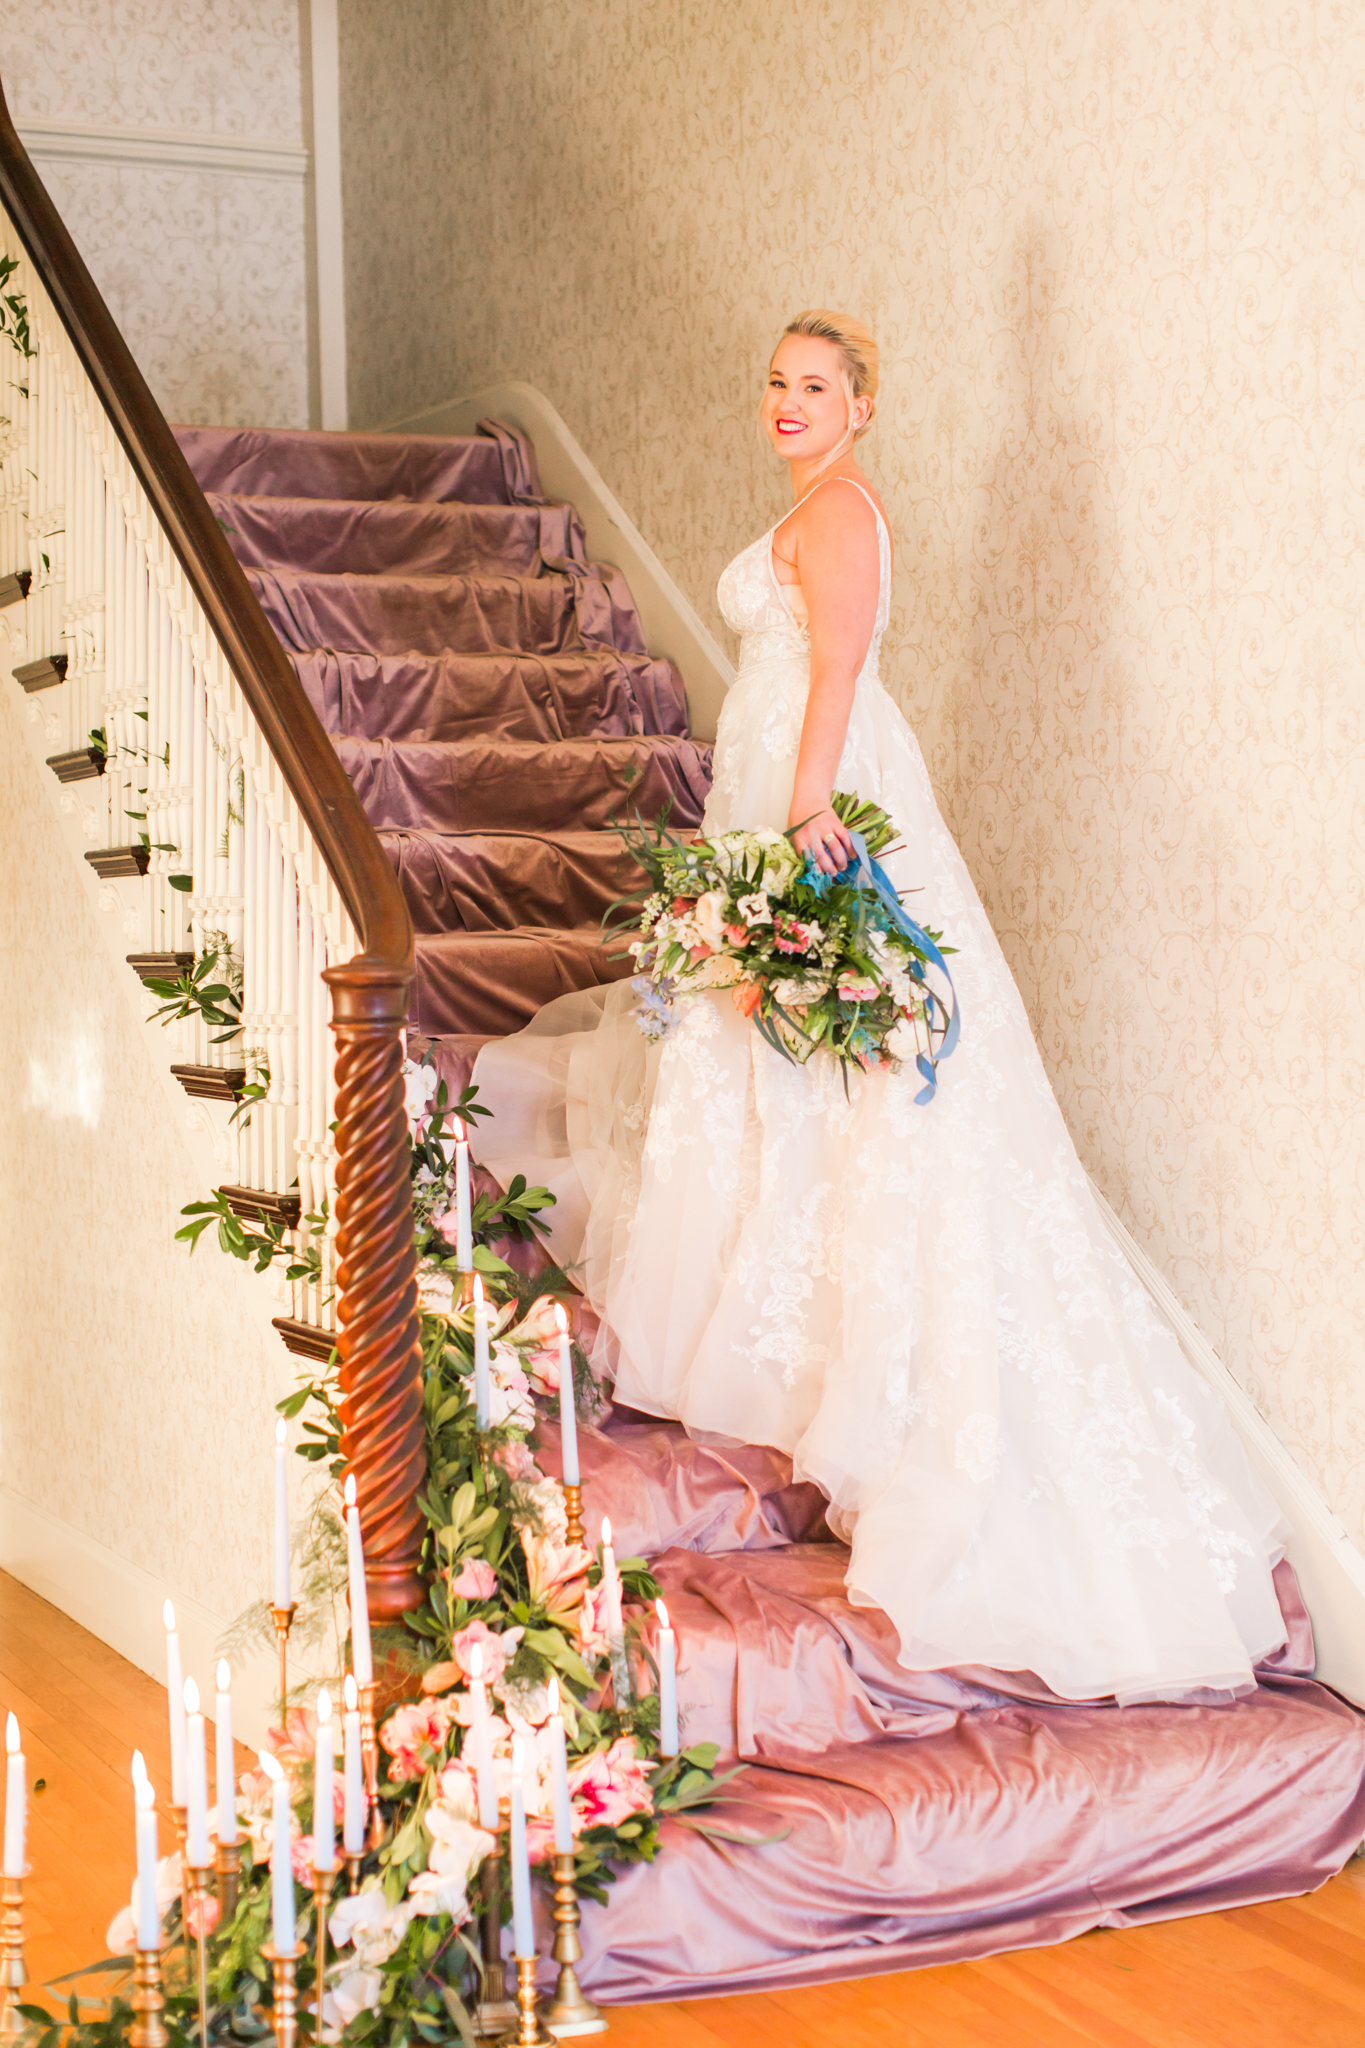 Haley Mansion Winter Wedding - Shaina Lee Photography-143.jpg